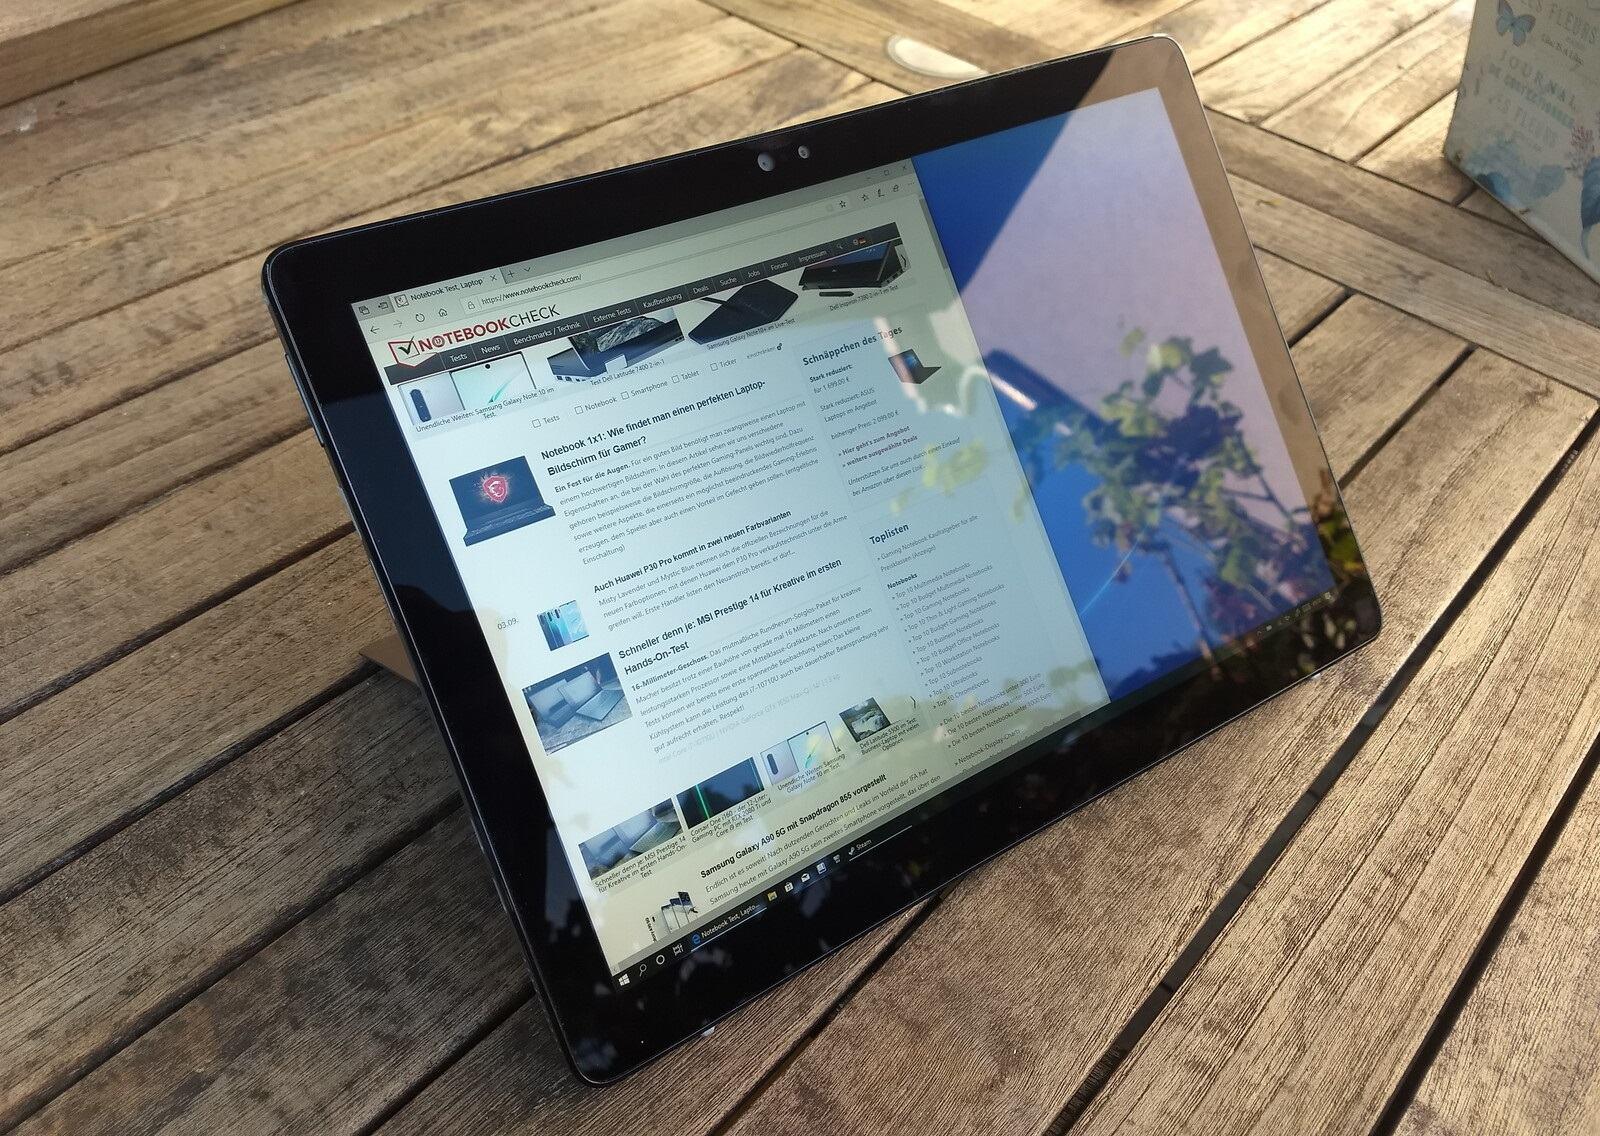 đánh giá laptop Dell Latitude 7200 2 in 1